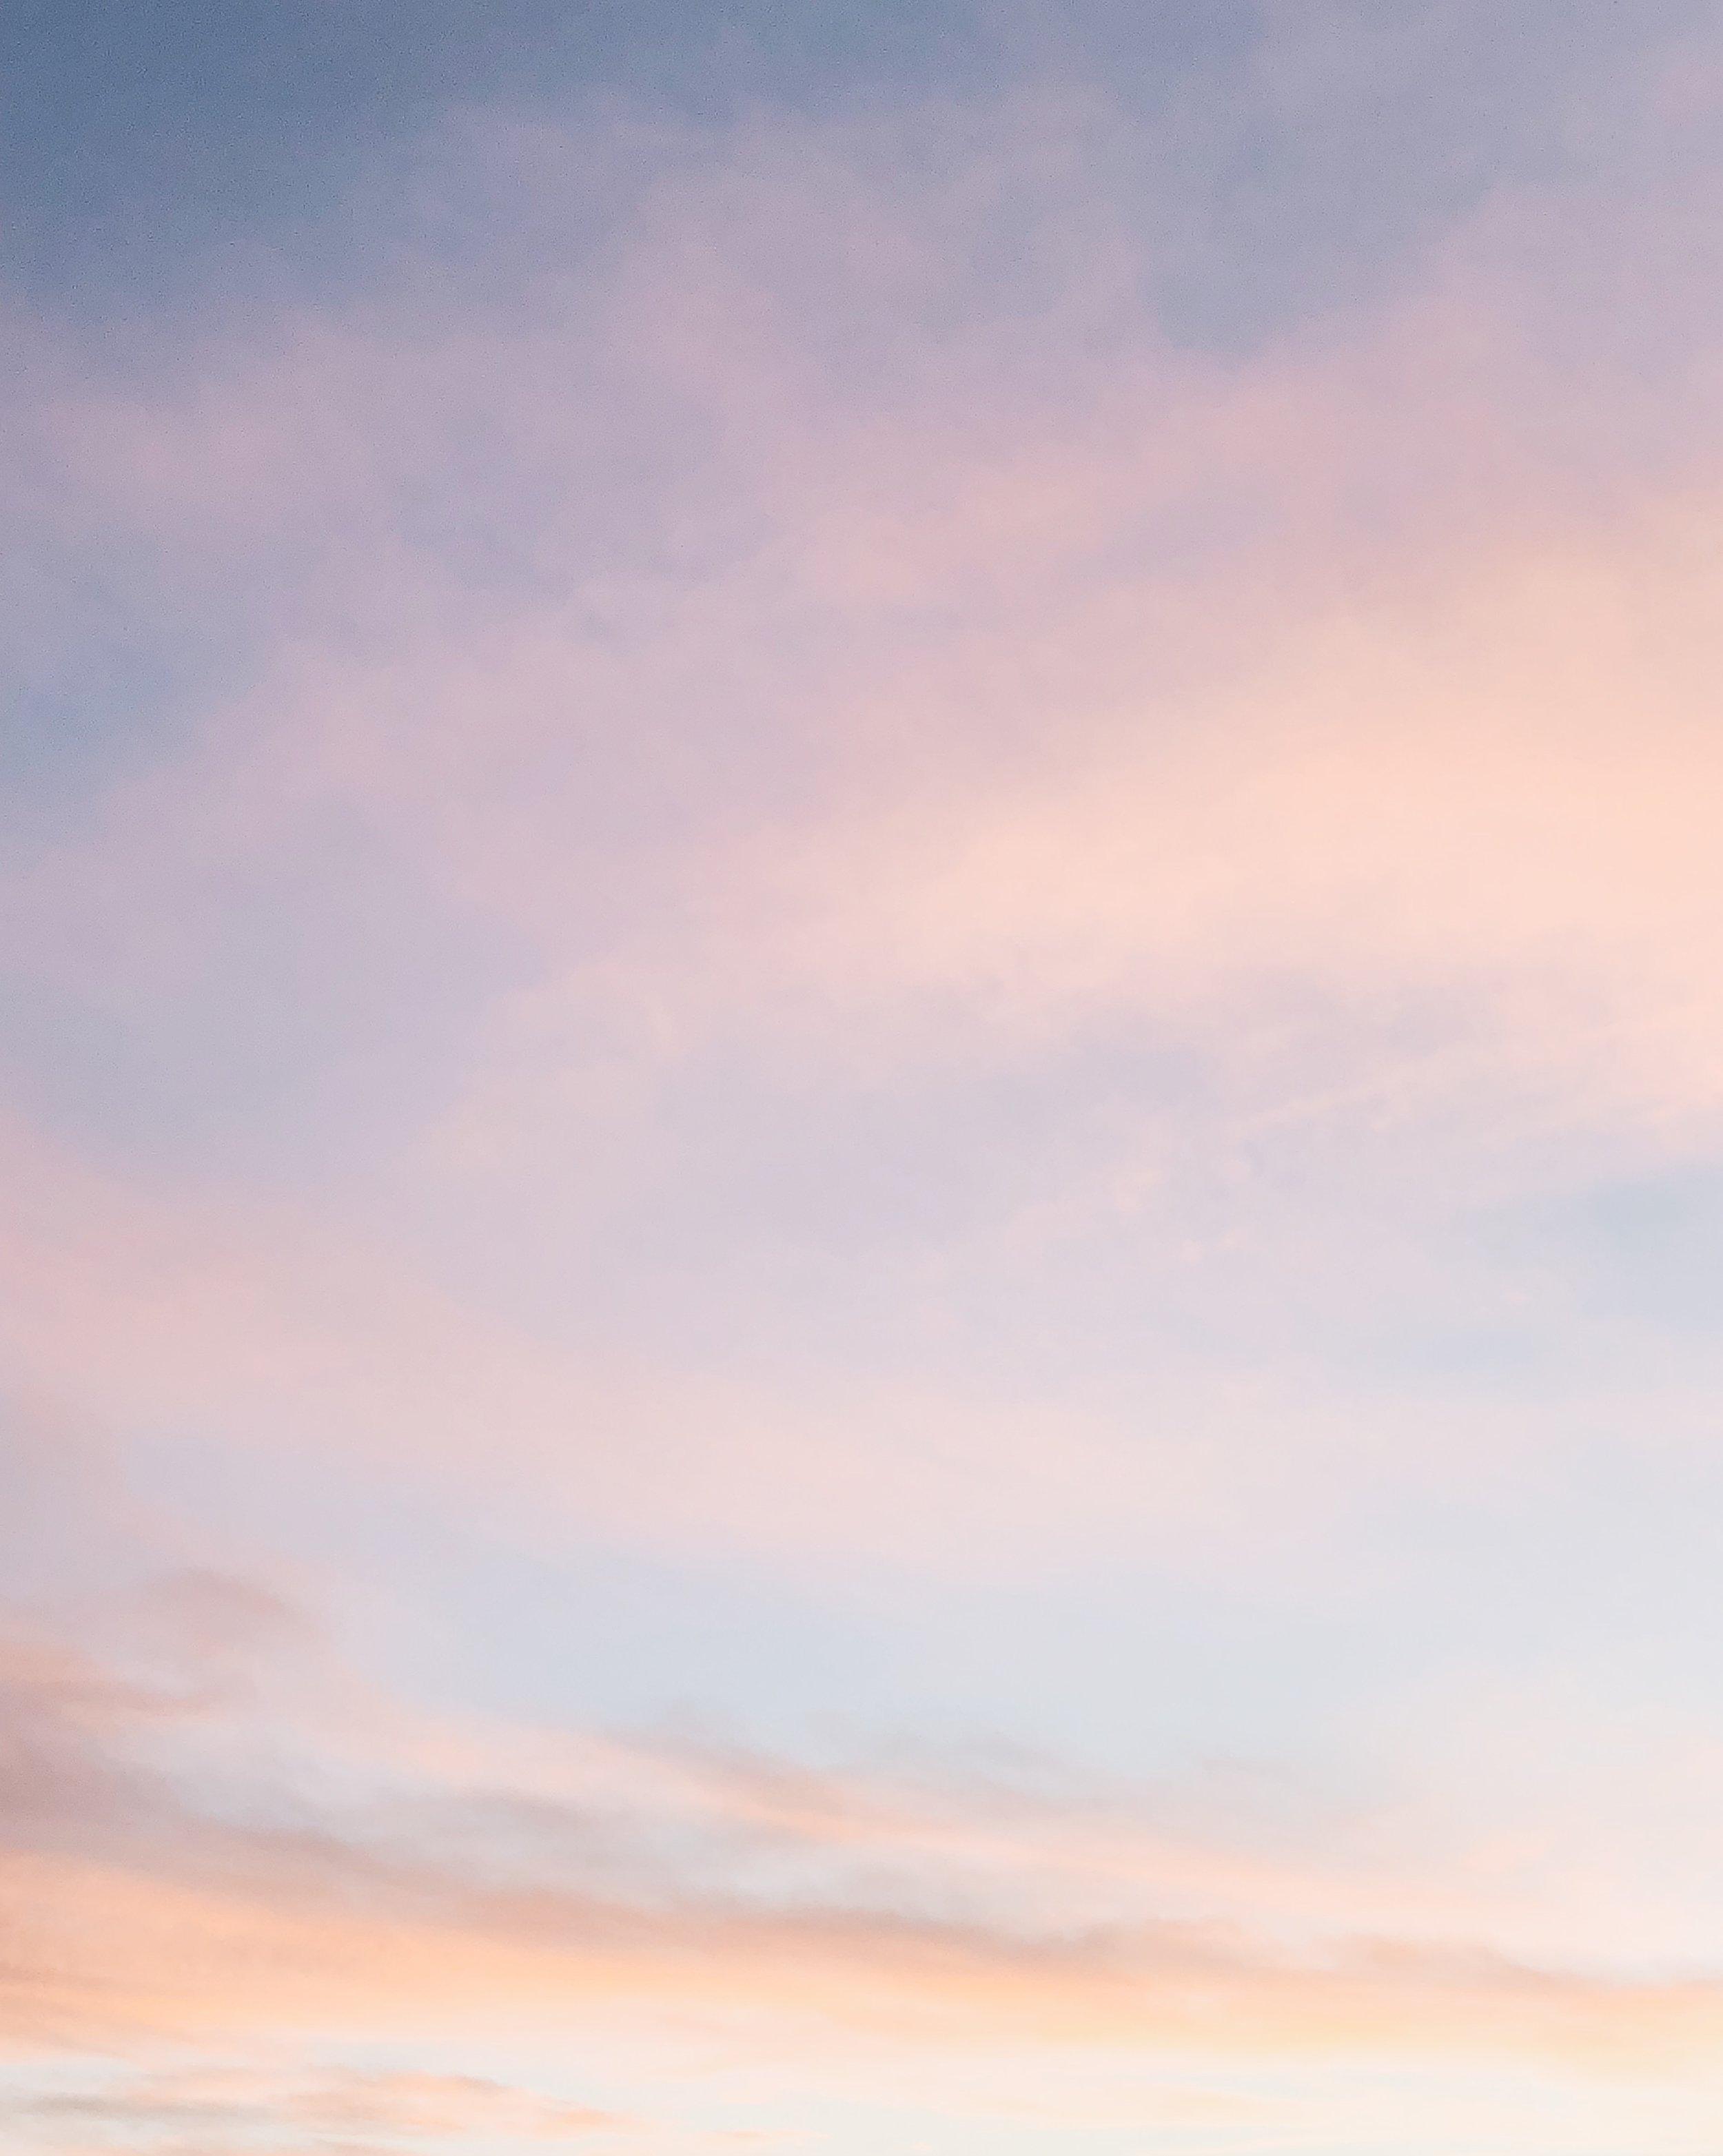 Cotton Candy Sky.JPG